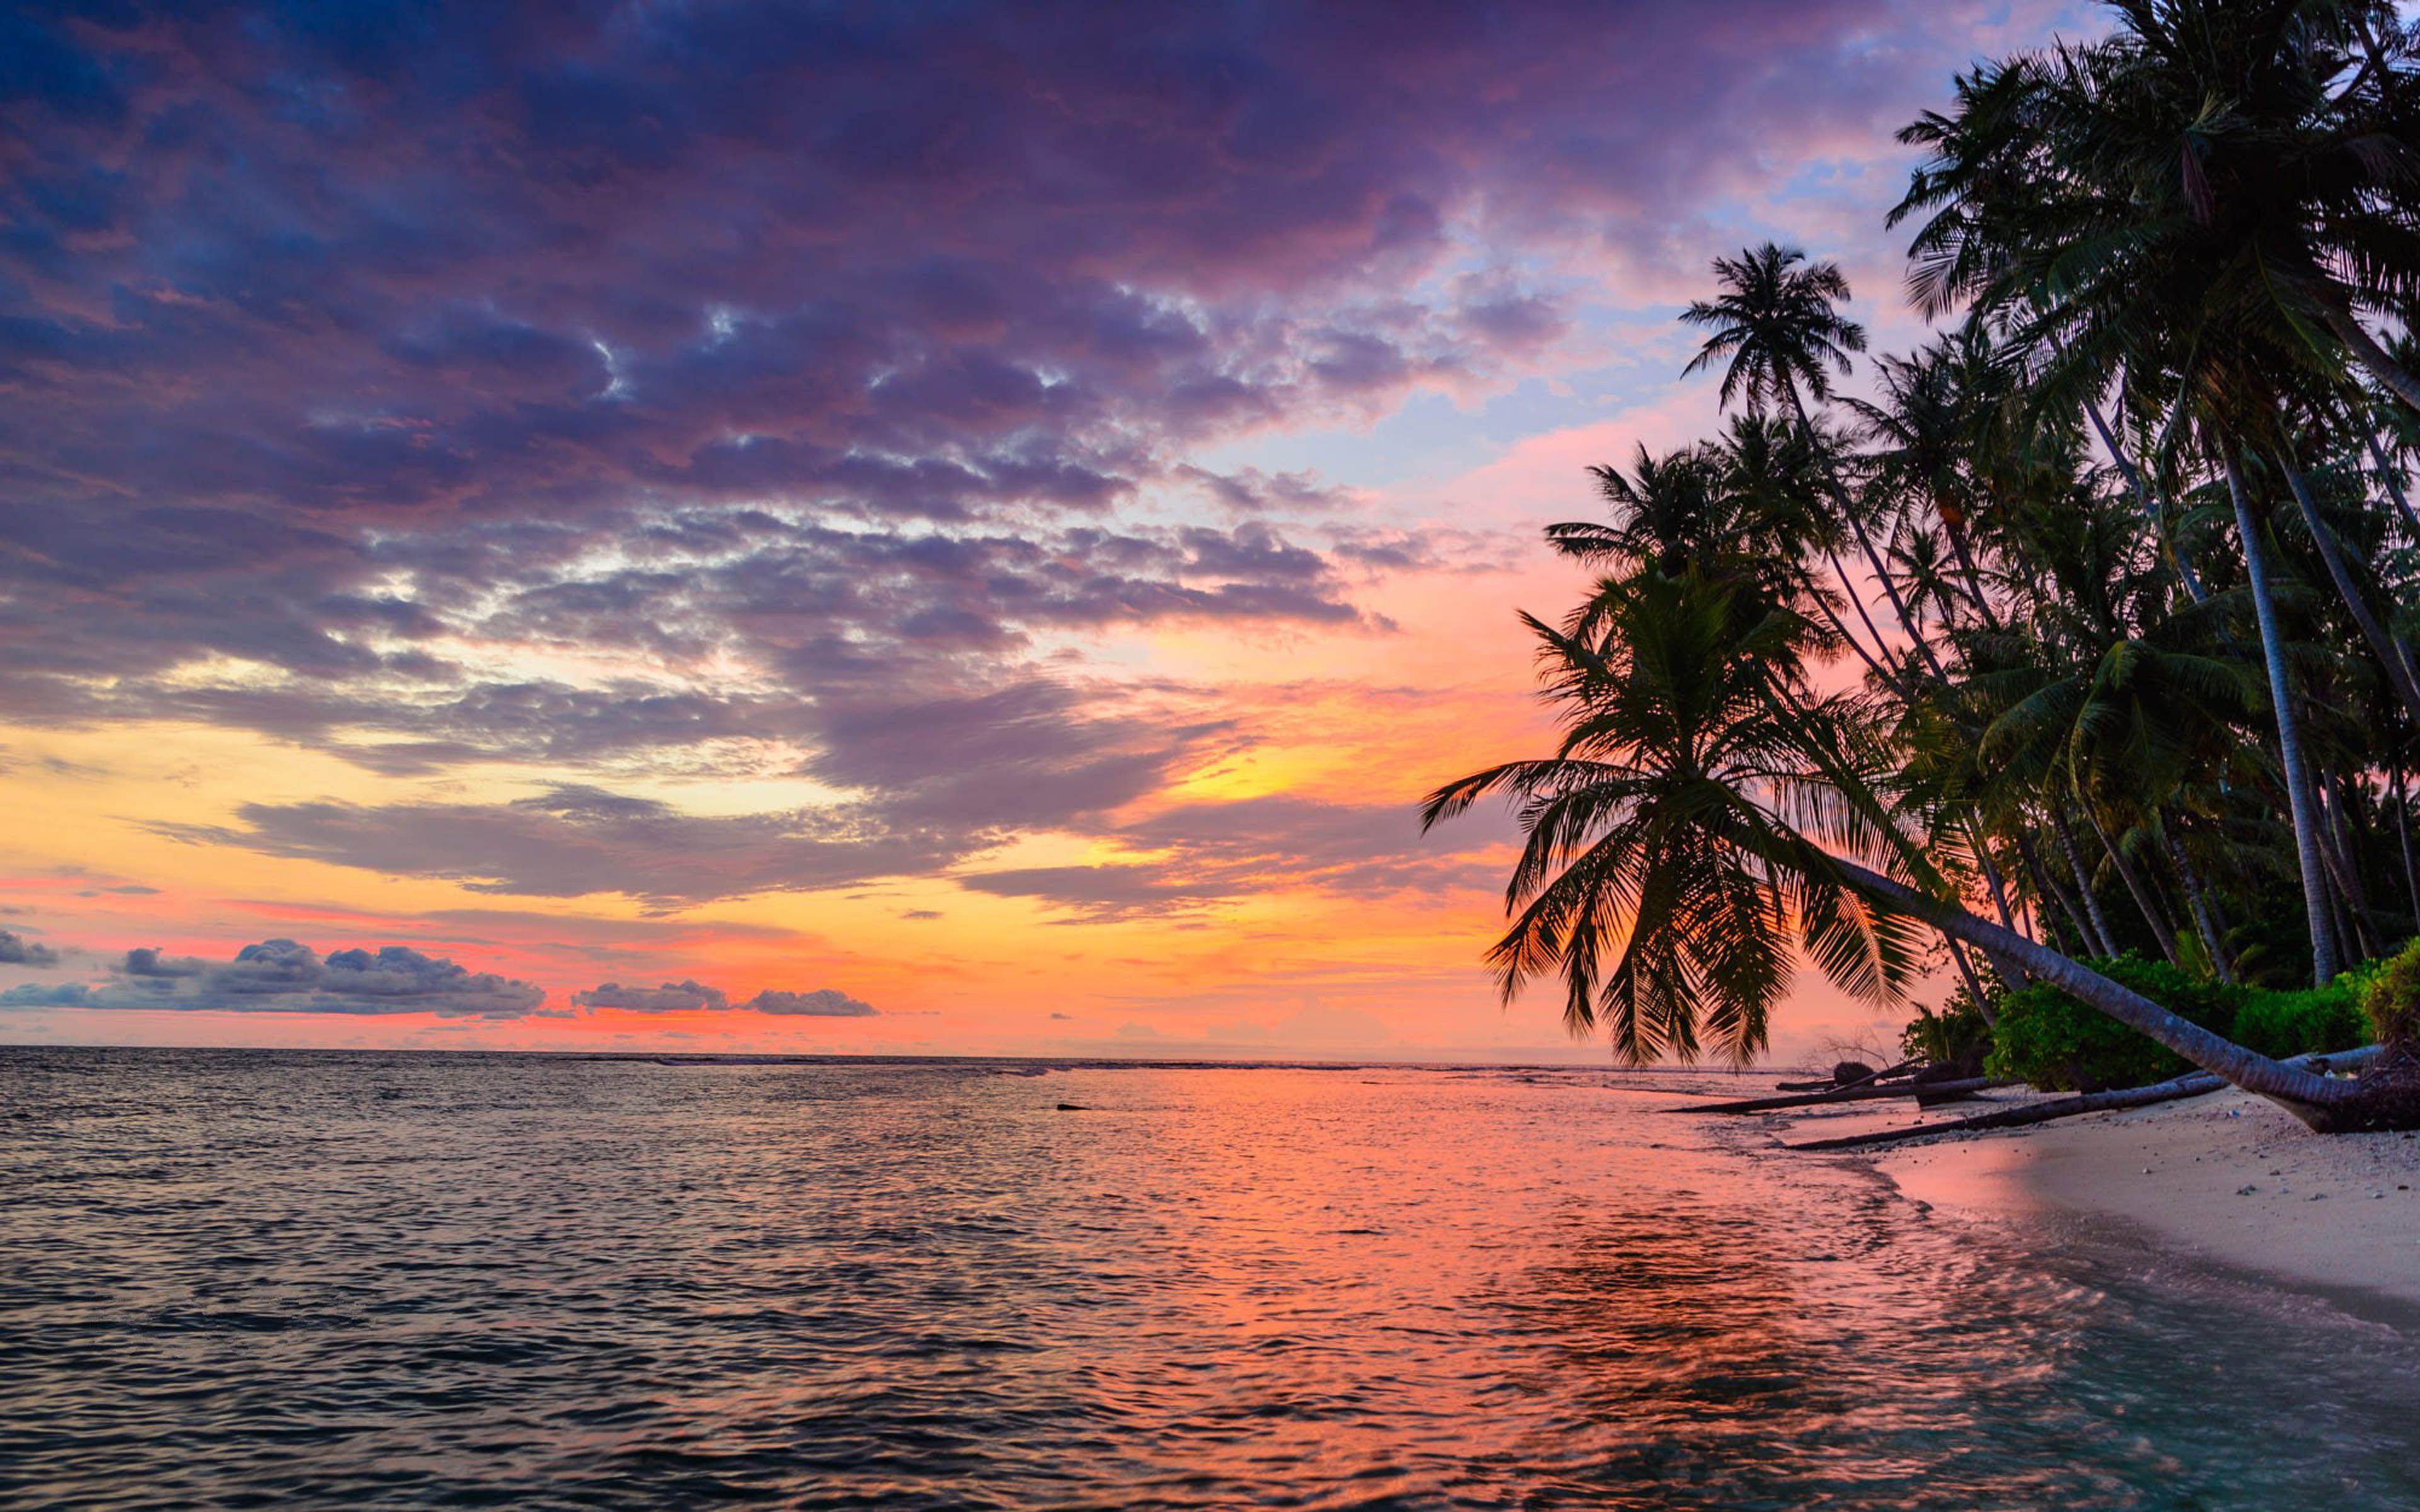 Landscape Coast Sunset 4k HD Wallpapers - Wallpaper Cave